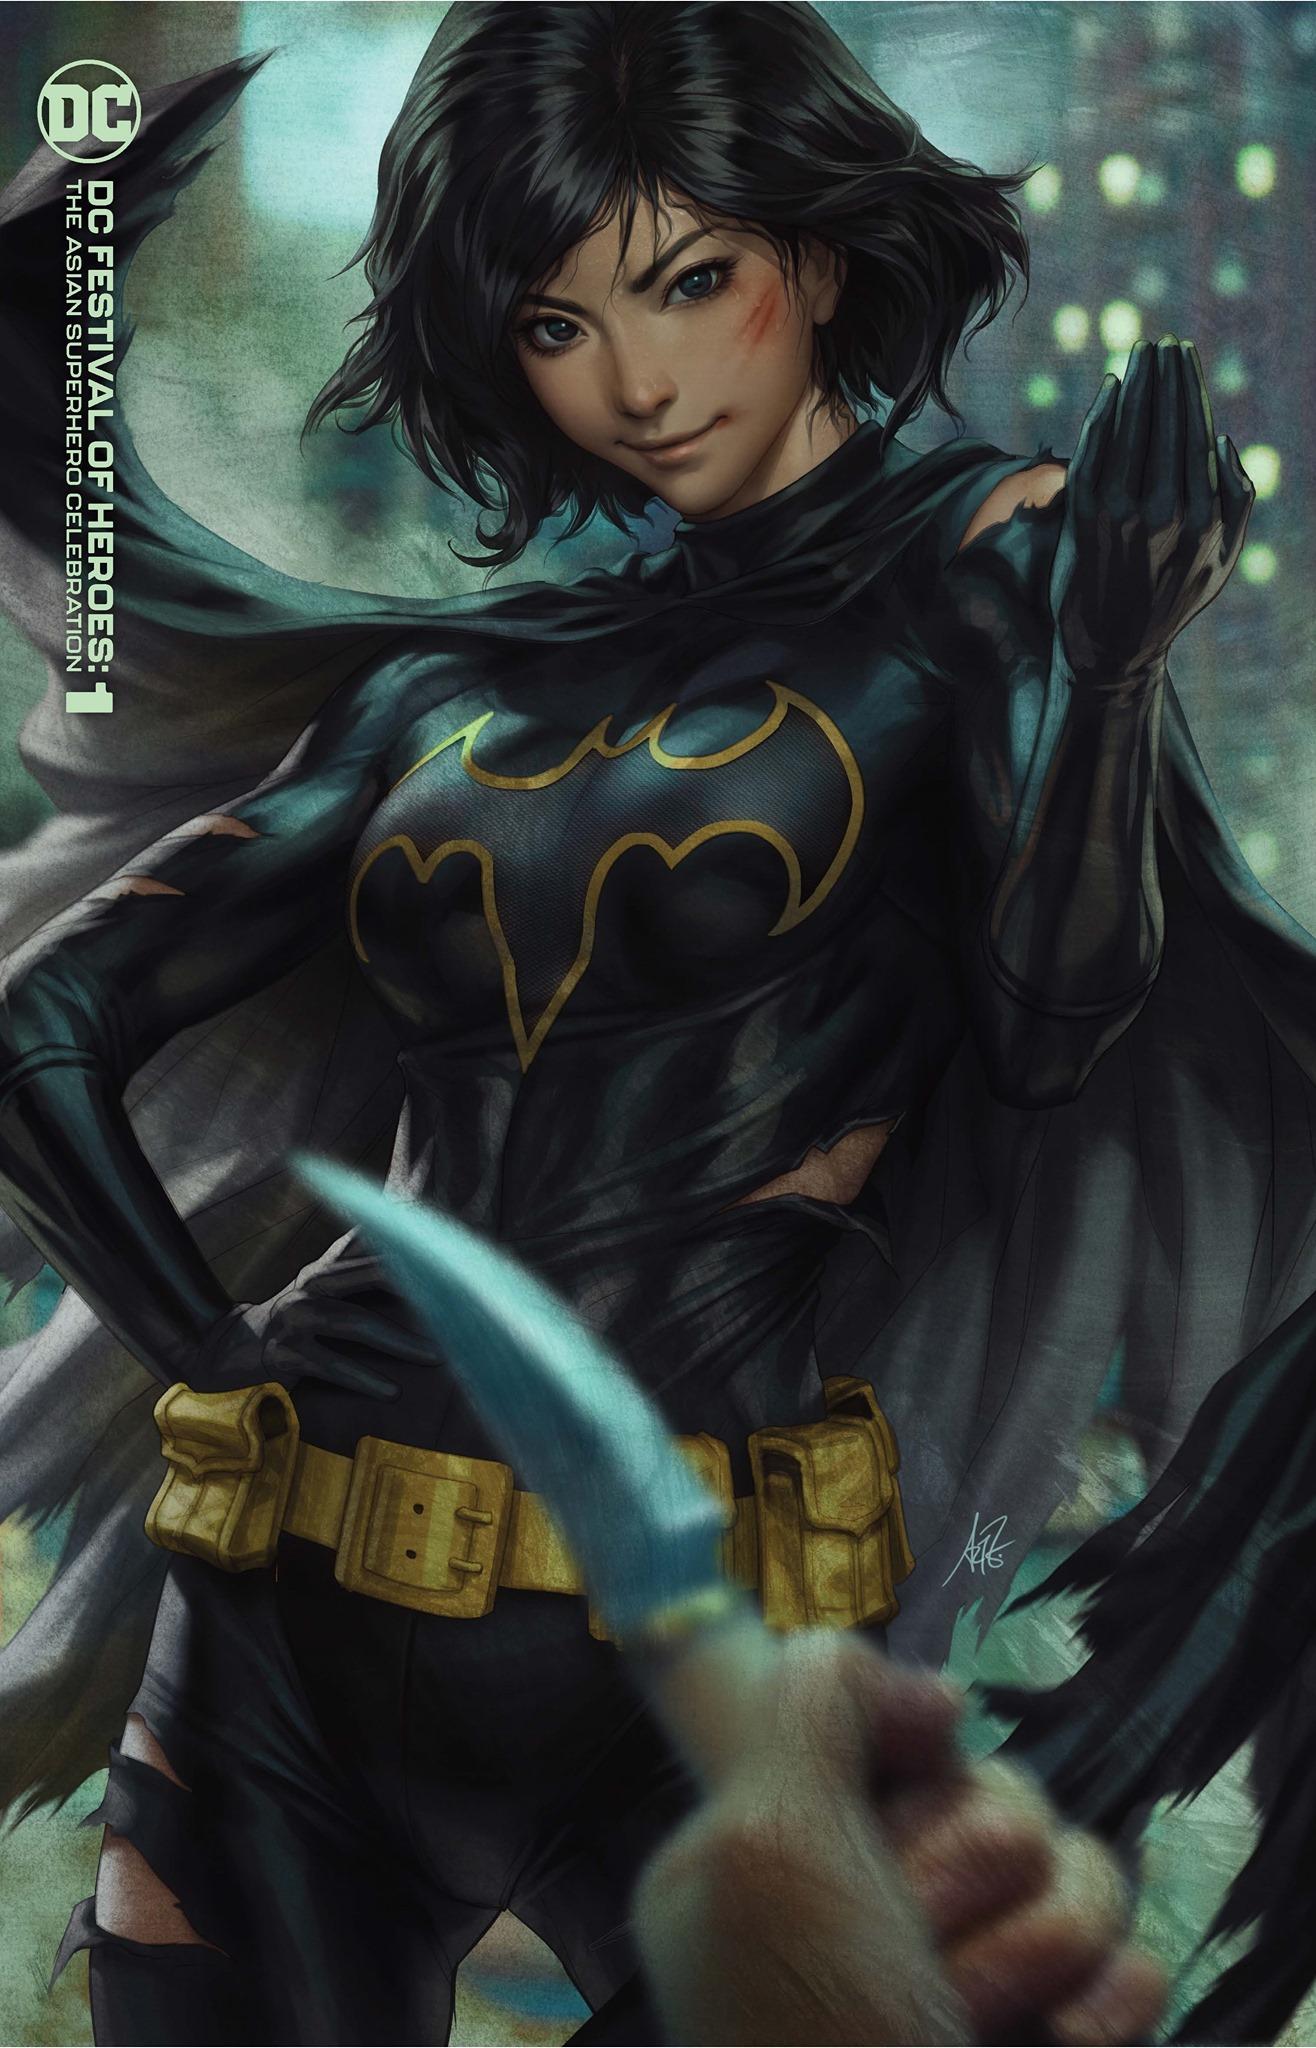 Dice Latte - DC Festival of Heroes The Asian Superhero Celebration #1 (One  Shot) Cover B Stanley Artgerm Lau Variant